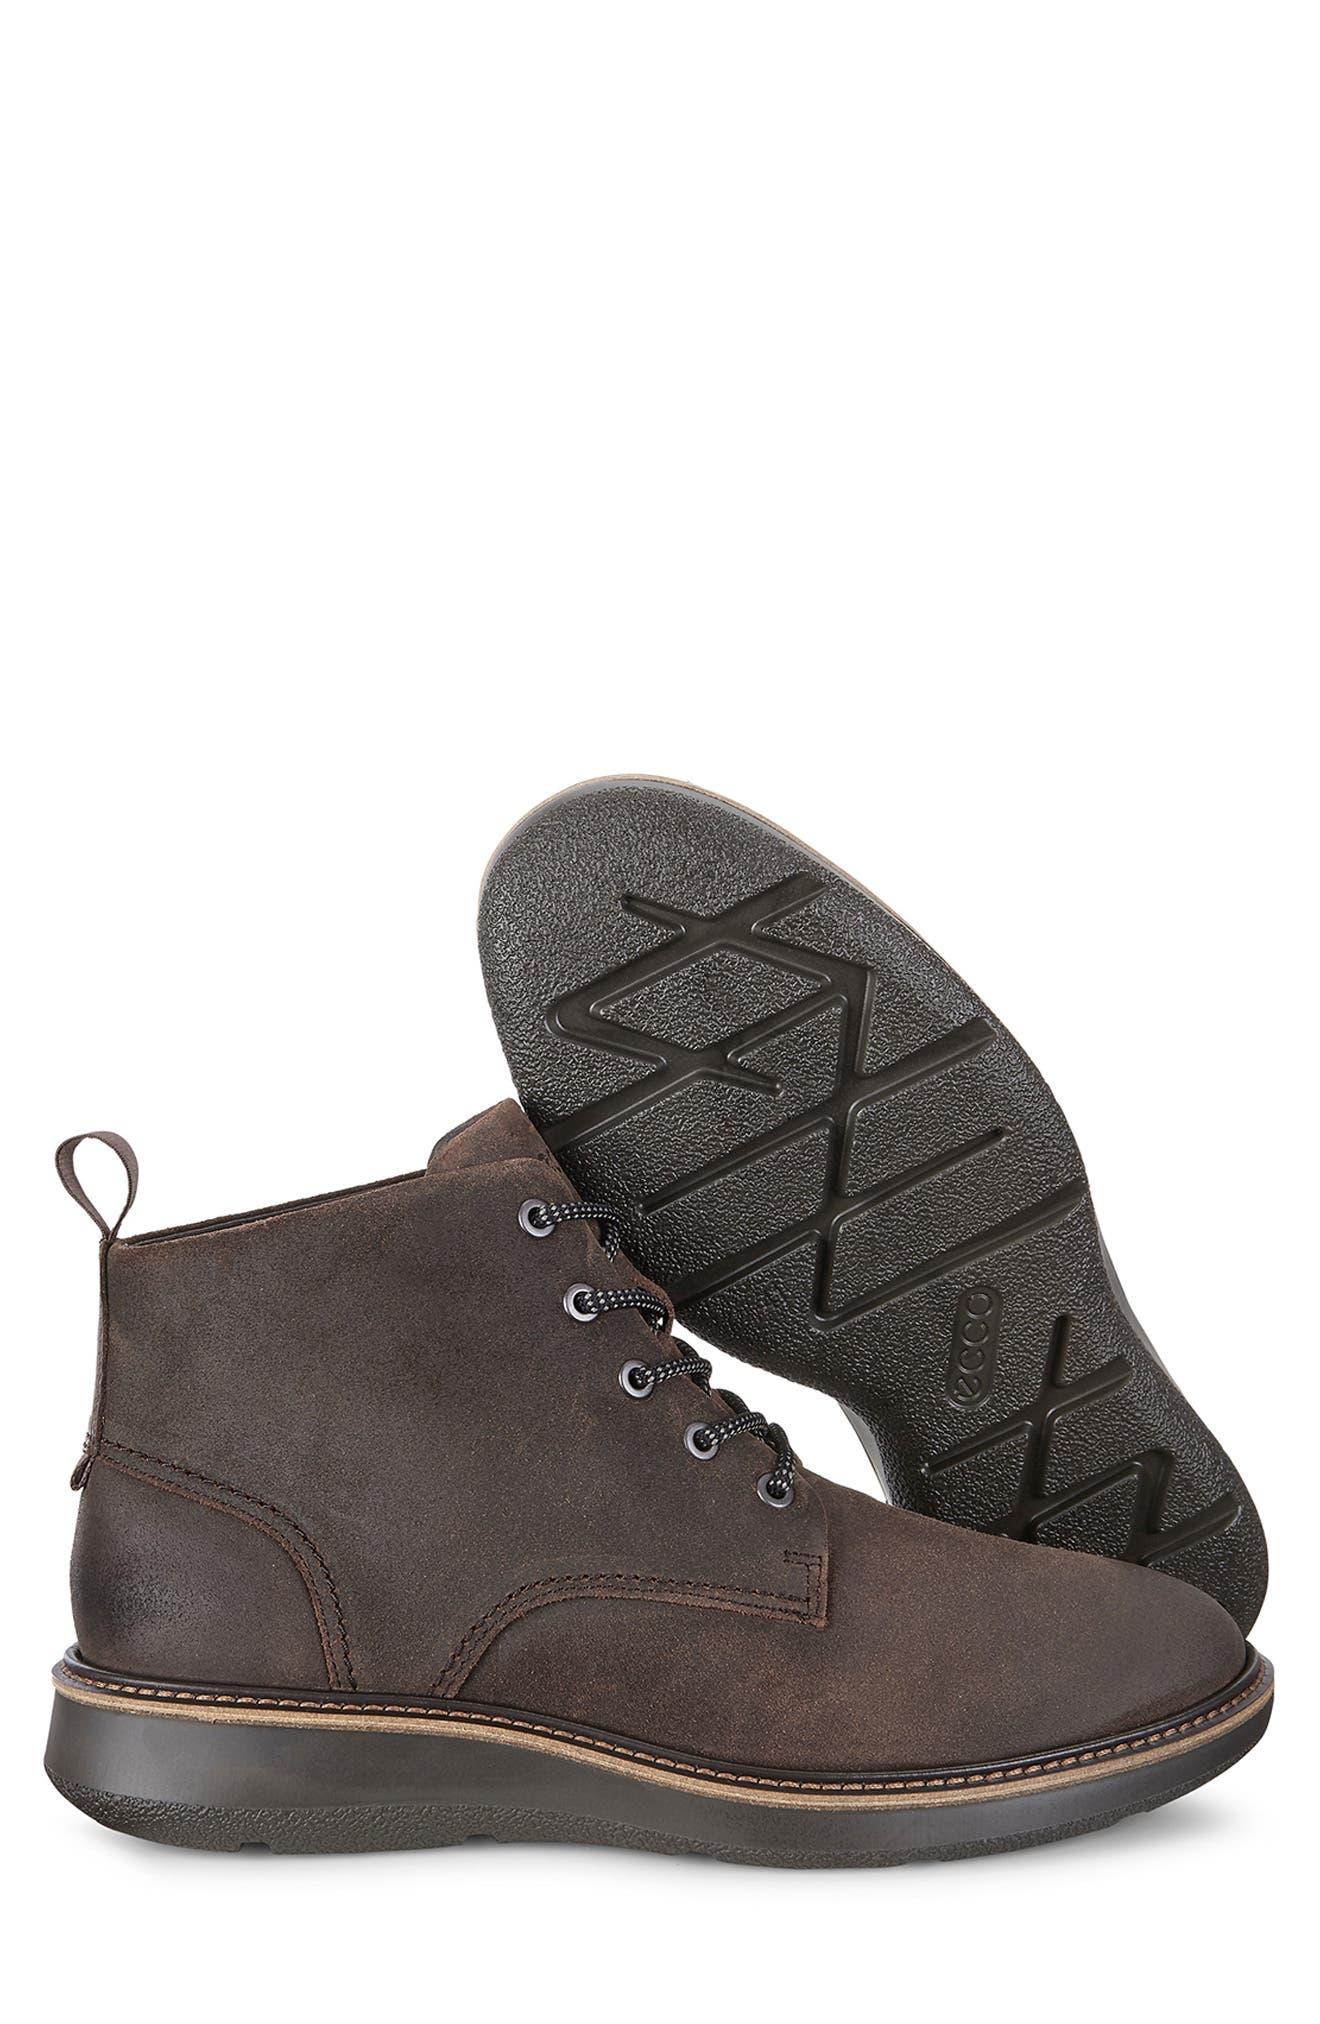 Aurora Plain Toe Boot,                             Alternate thumbnail 4, color,                             COFFEE SUEDE